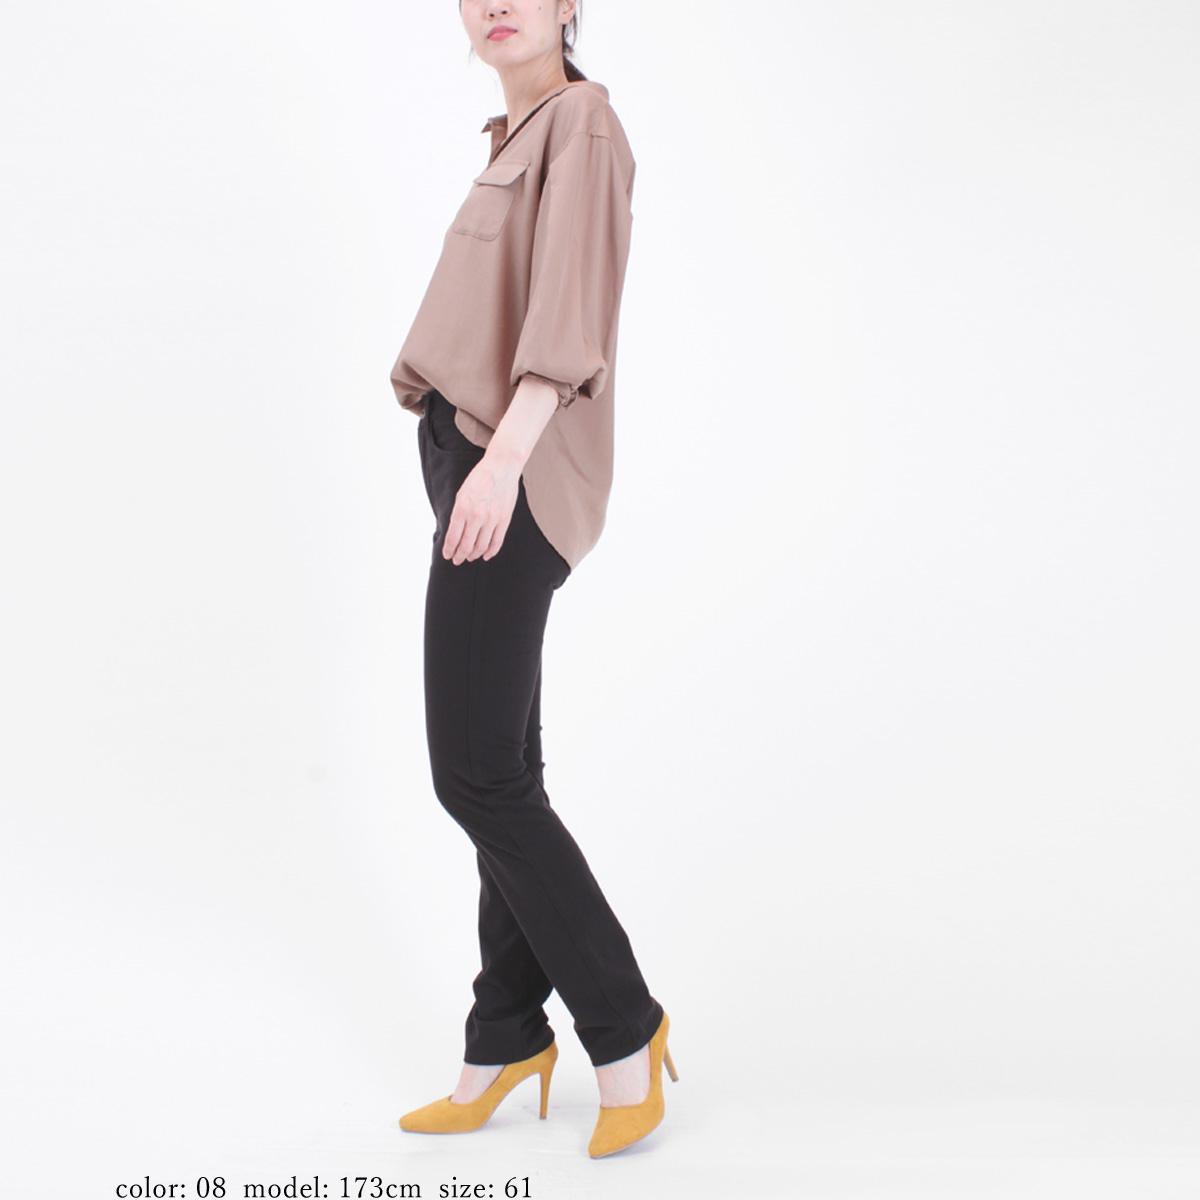 【SALE】Mrs.Jeana ■涼■ ソフトクールニットカラー サマーストレート MJ4552